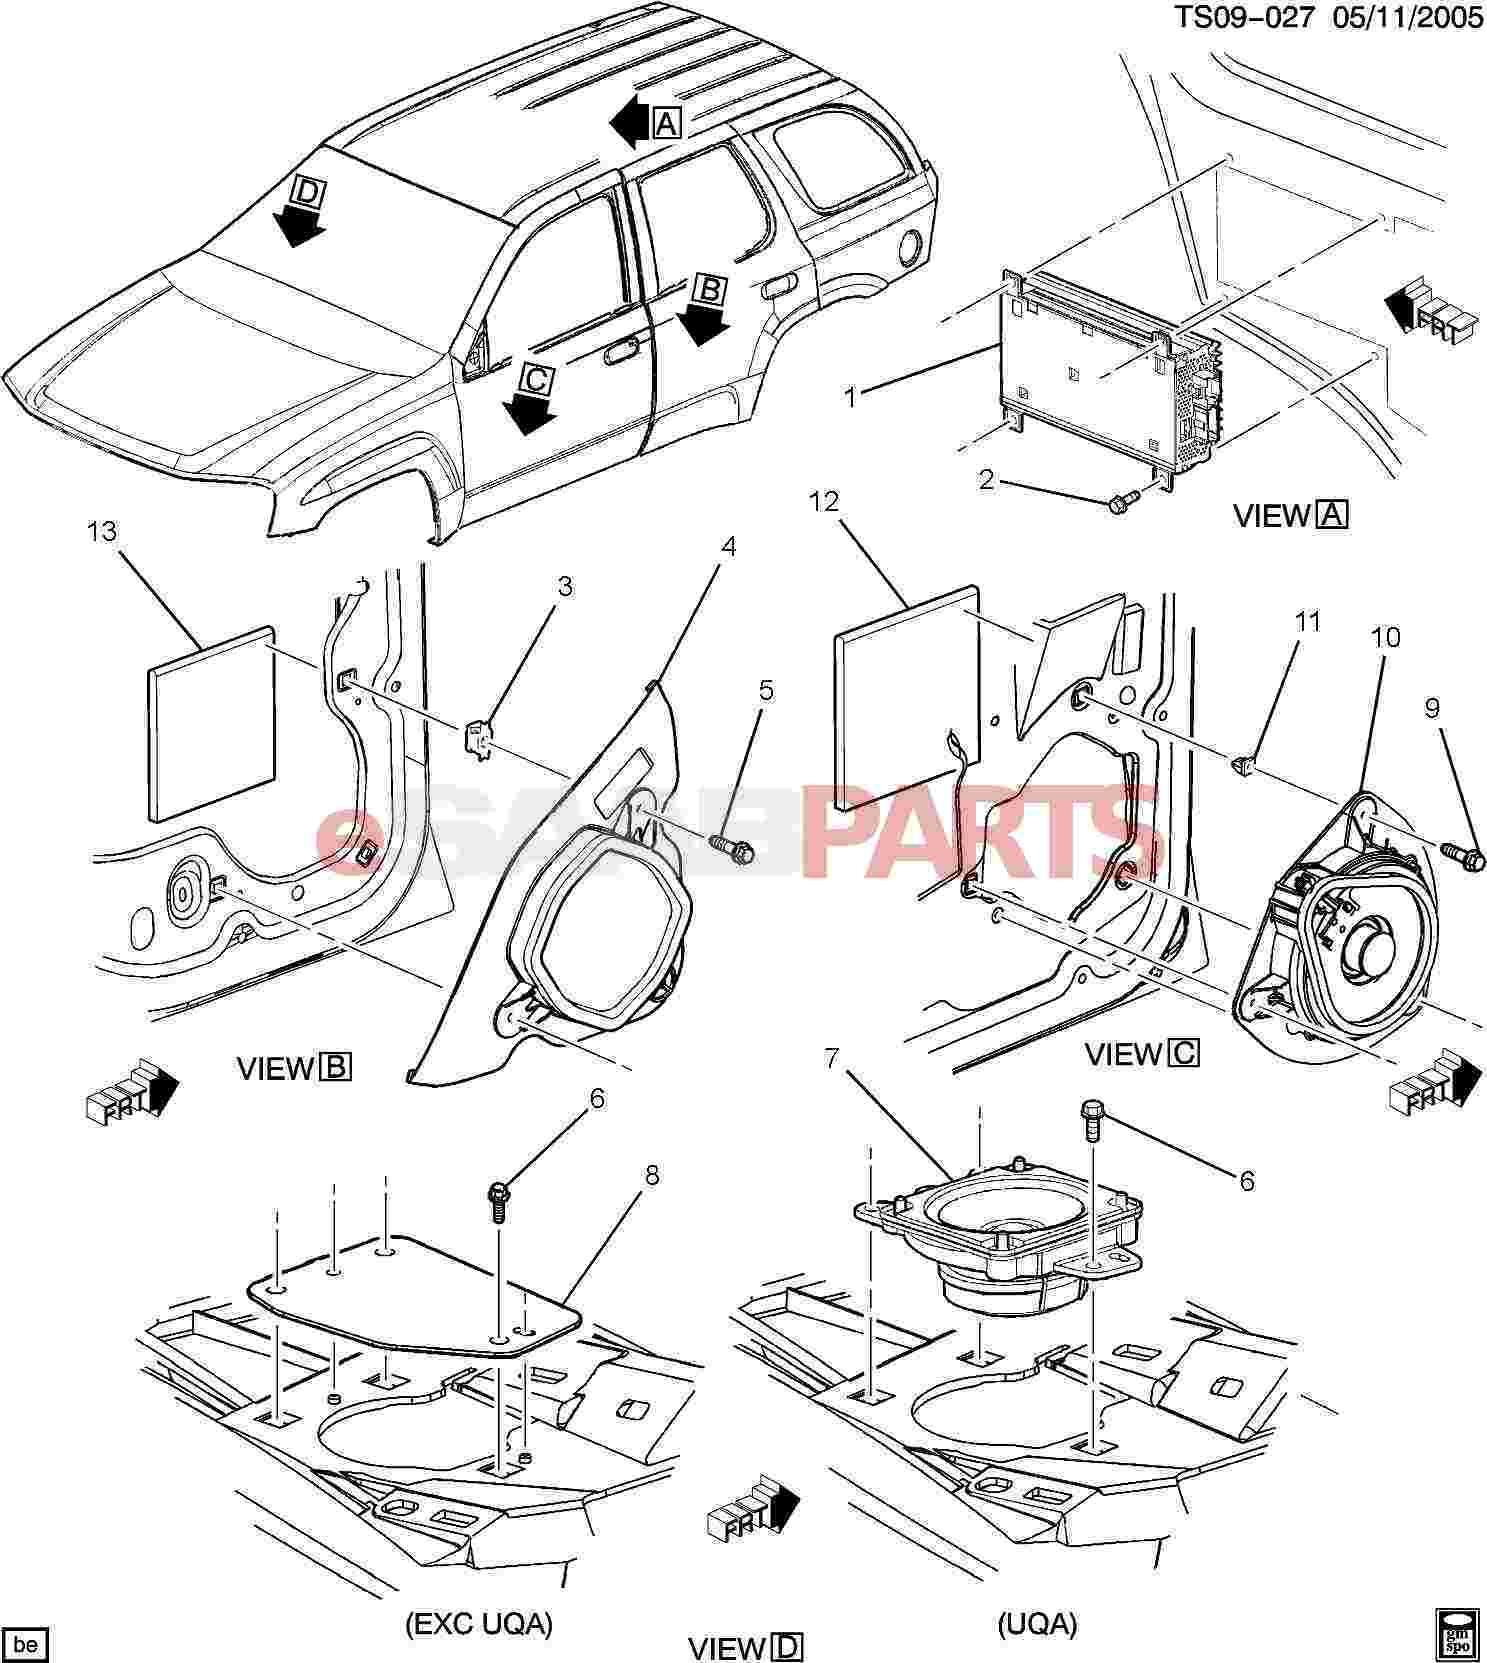 15013121 saab speaker rdo front genuine saab parts from 2007 Saab 9 7X Problems diagram image 7